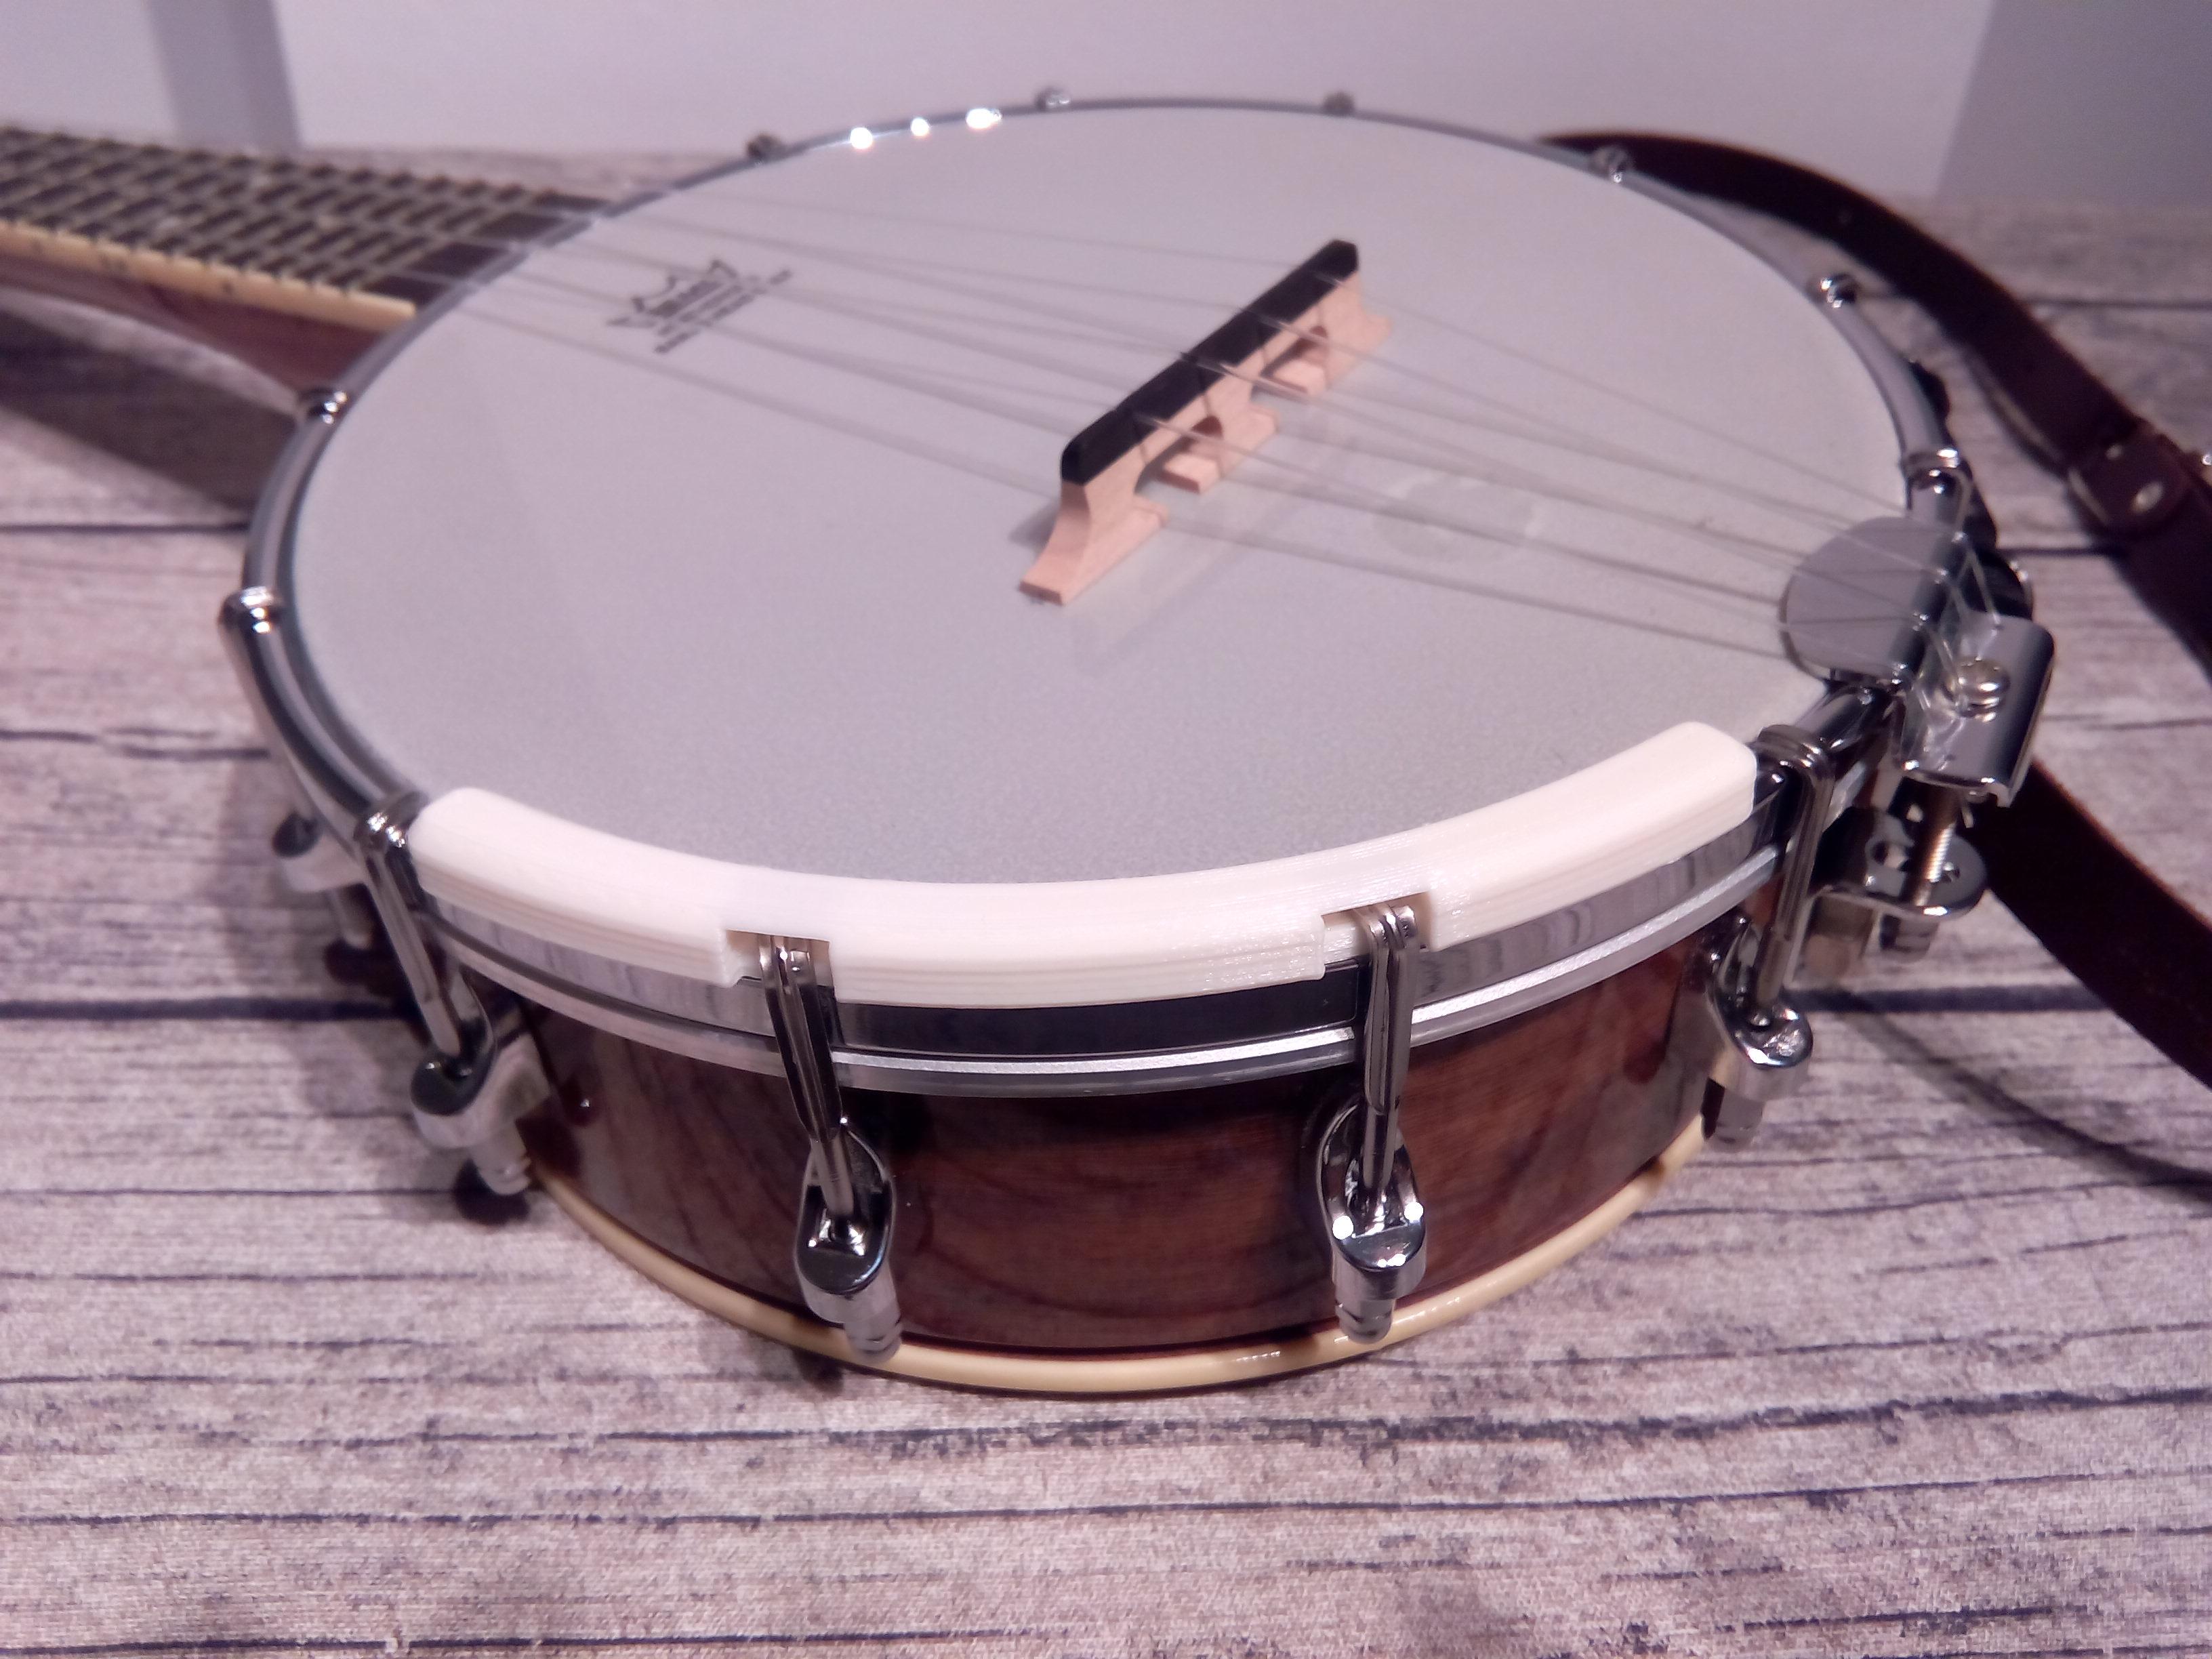 Banjolele / Banjo-Ukulele Armrest by FigaflorsiBraves